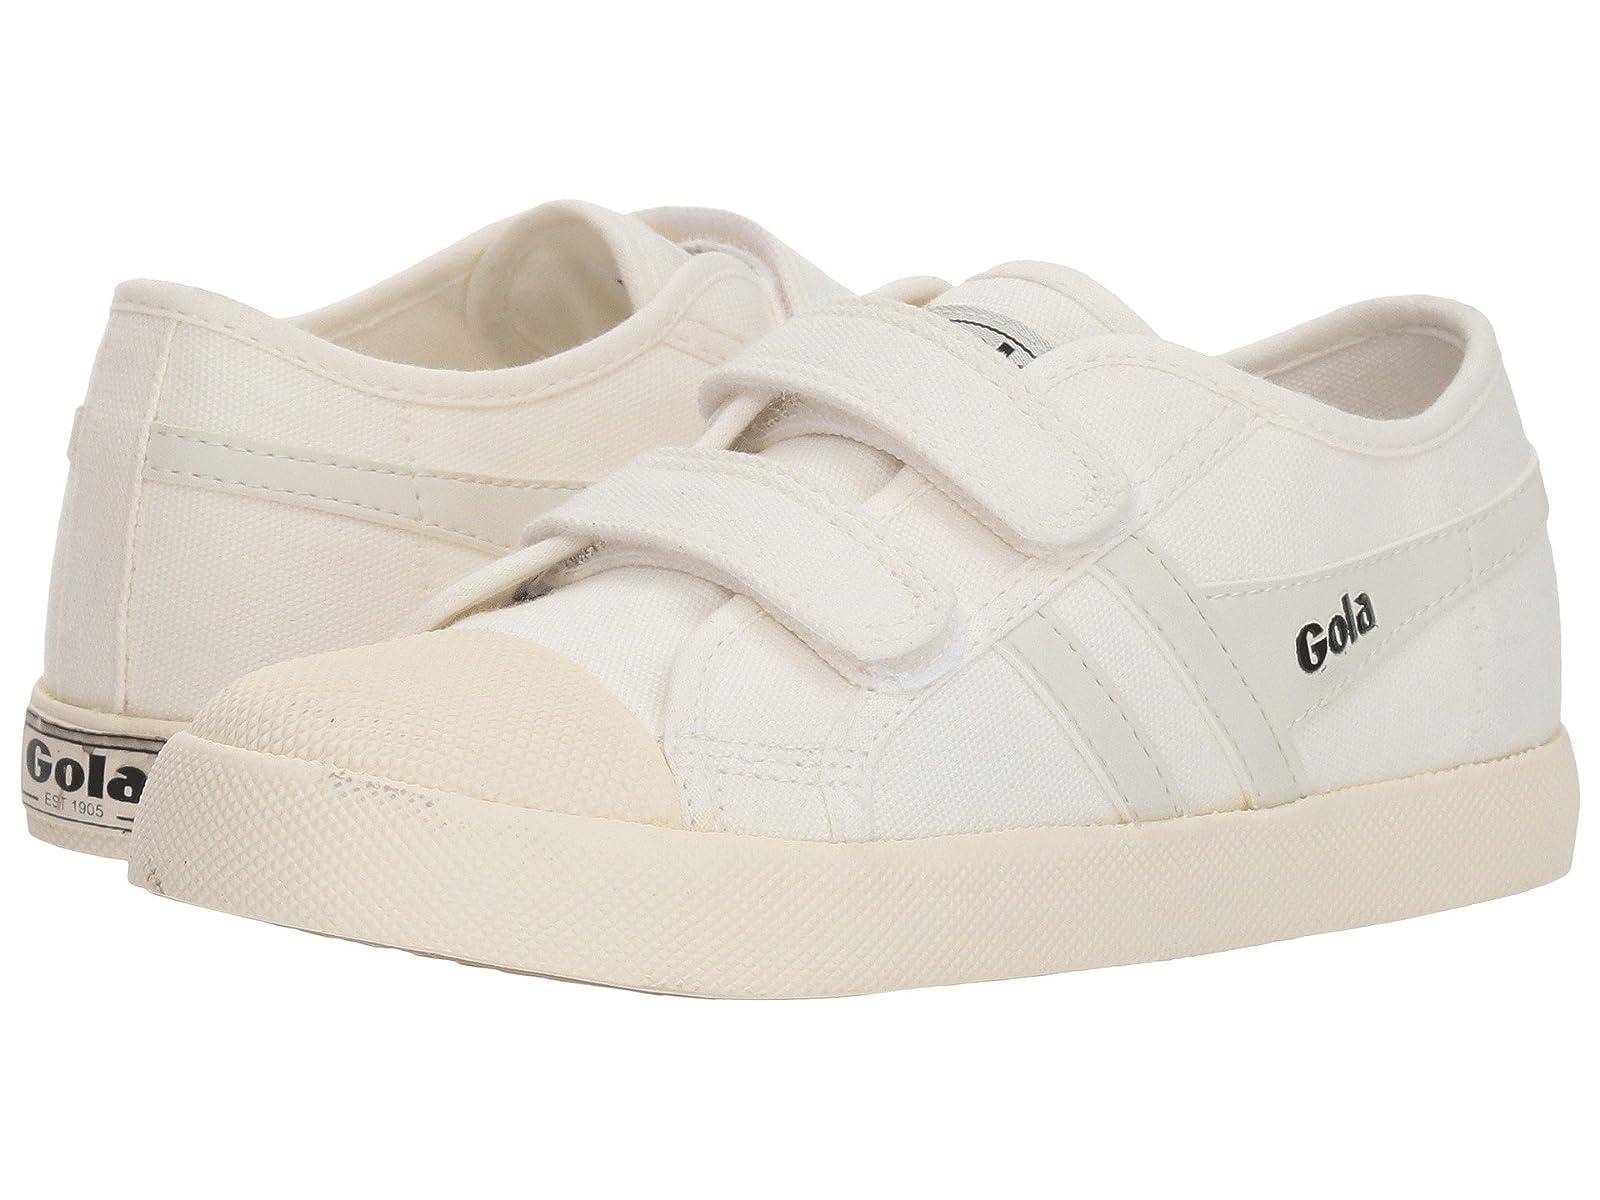 Gola Coaster (Toddler/Little Kid)Atmospheric grades have affordable shoes